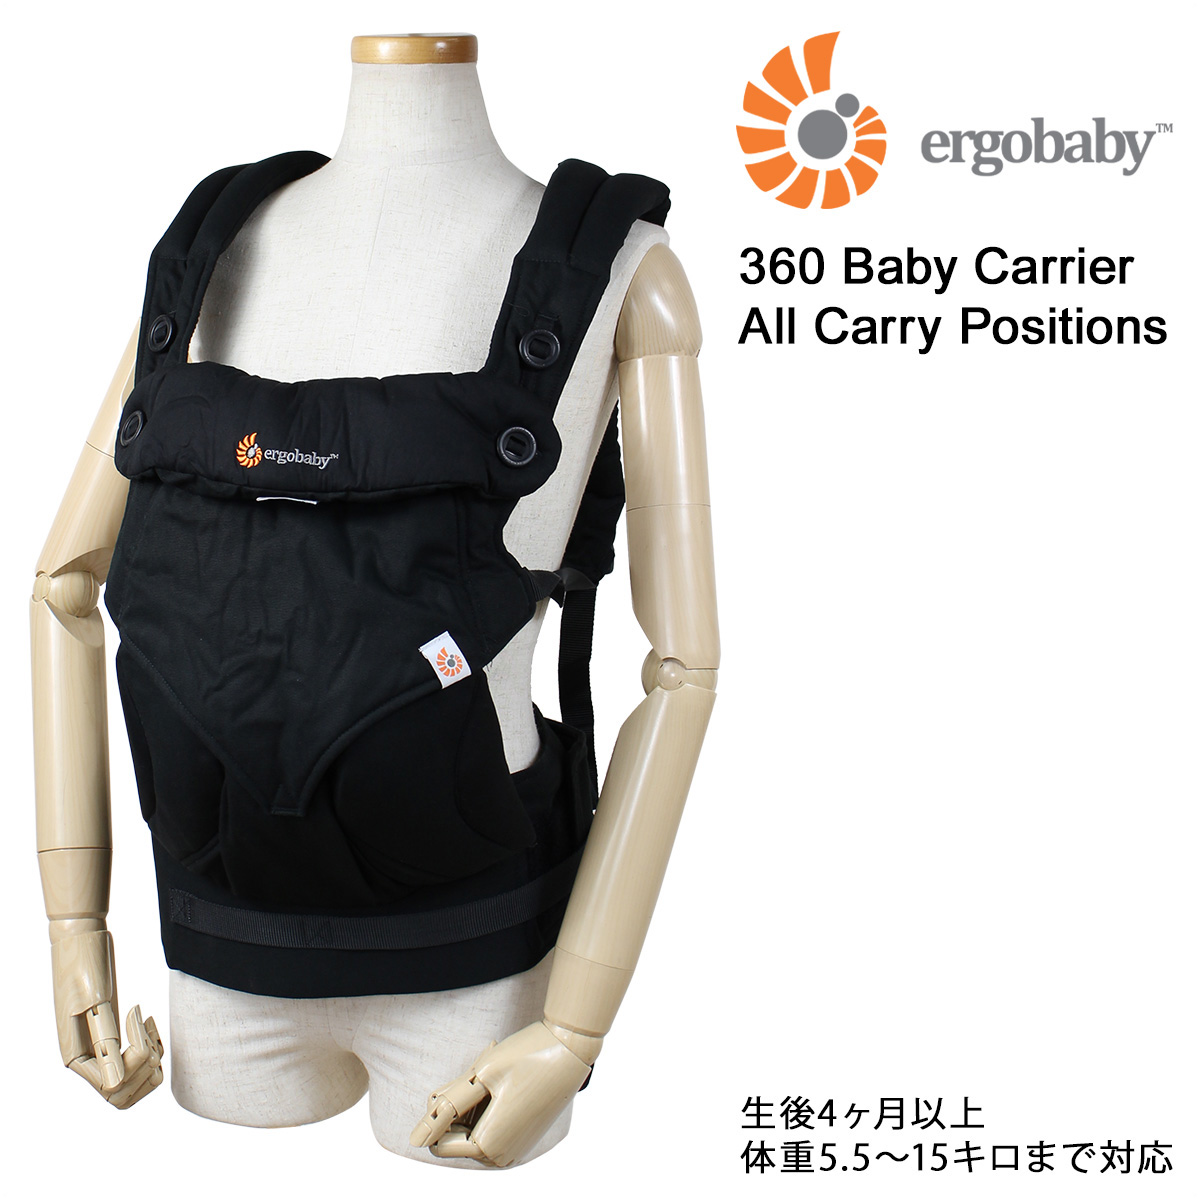 ERGOBABY BABY CARRIER ALL CARRY POSITIONS エルゴベビー エルゴ 360 抱っこ紐 ベビーキャリア ブラック